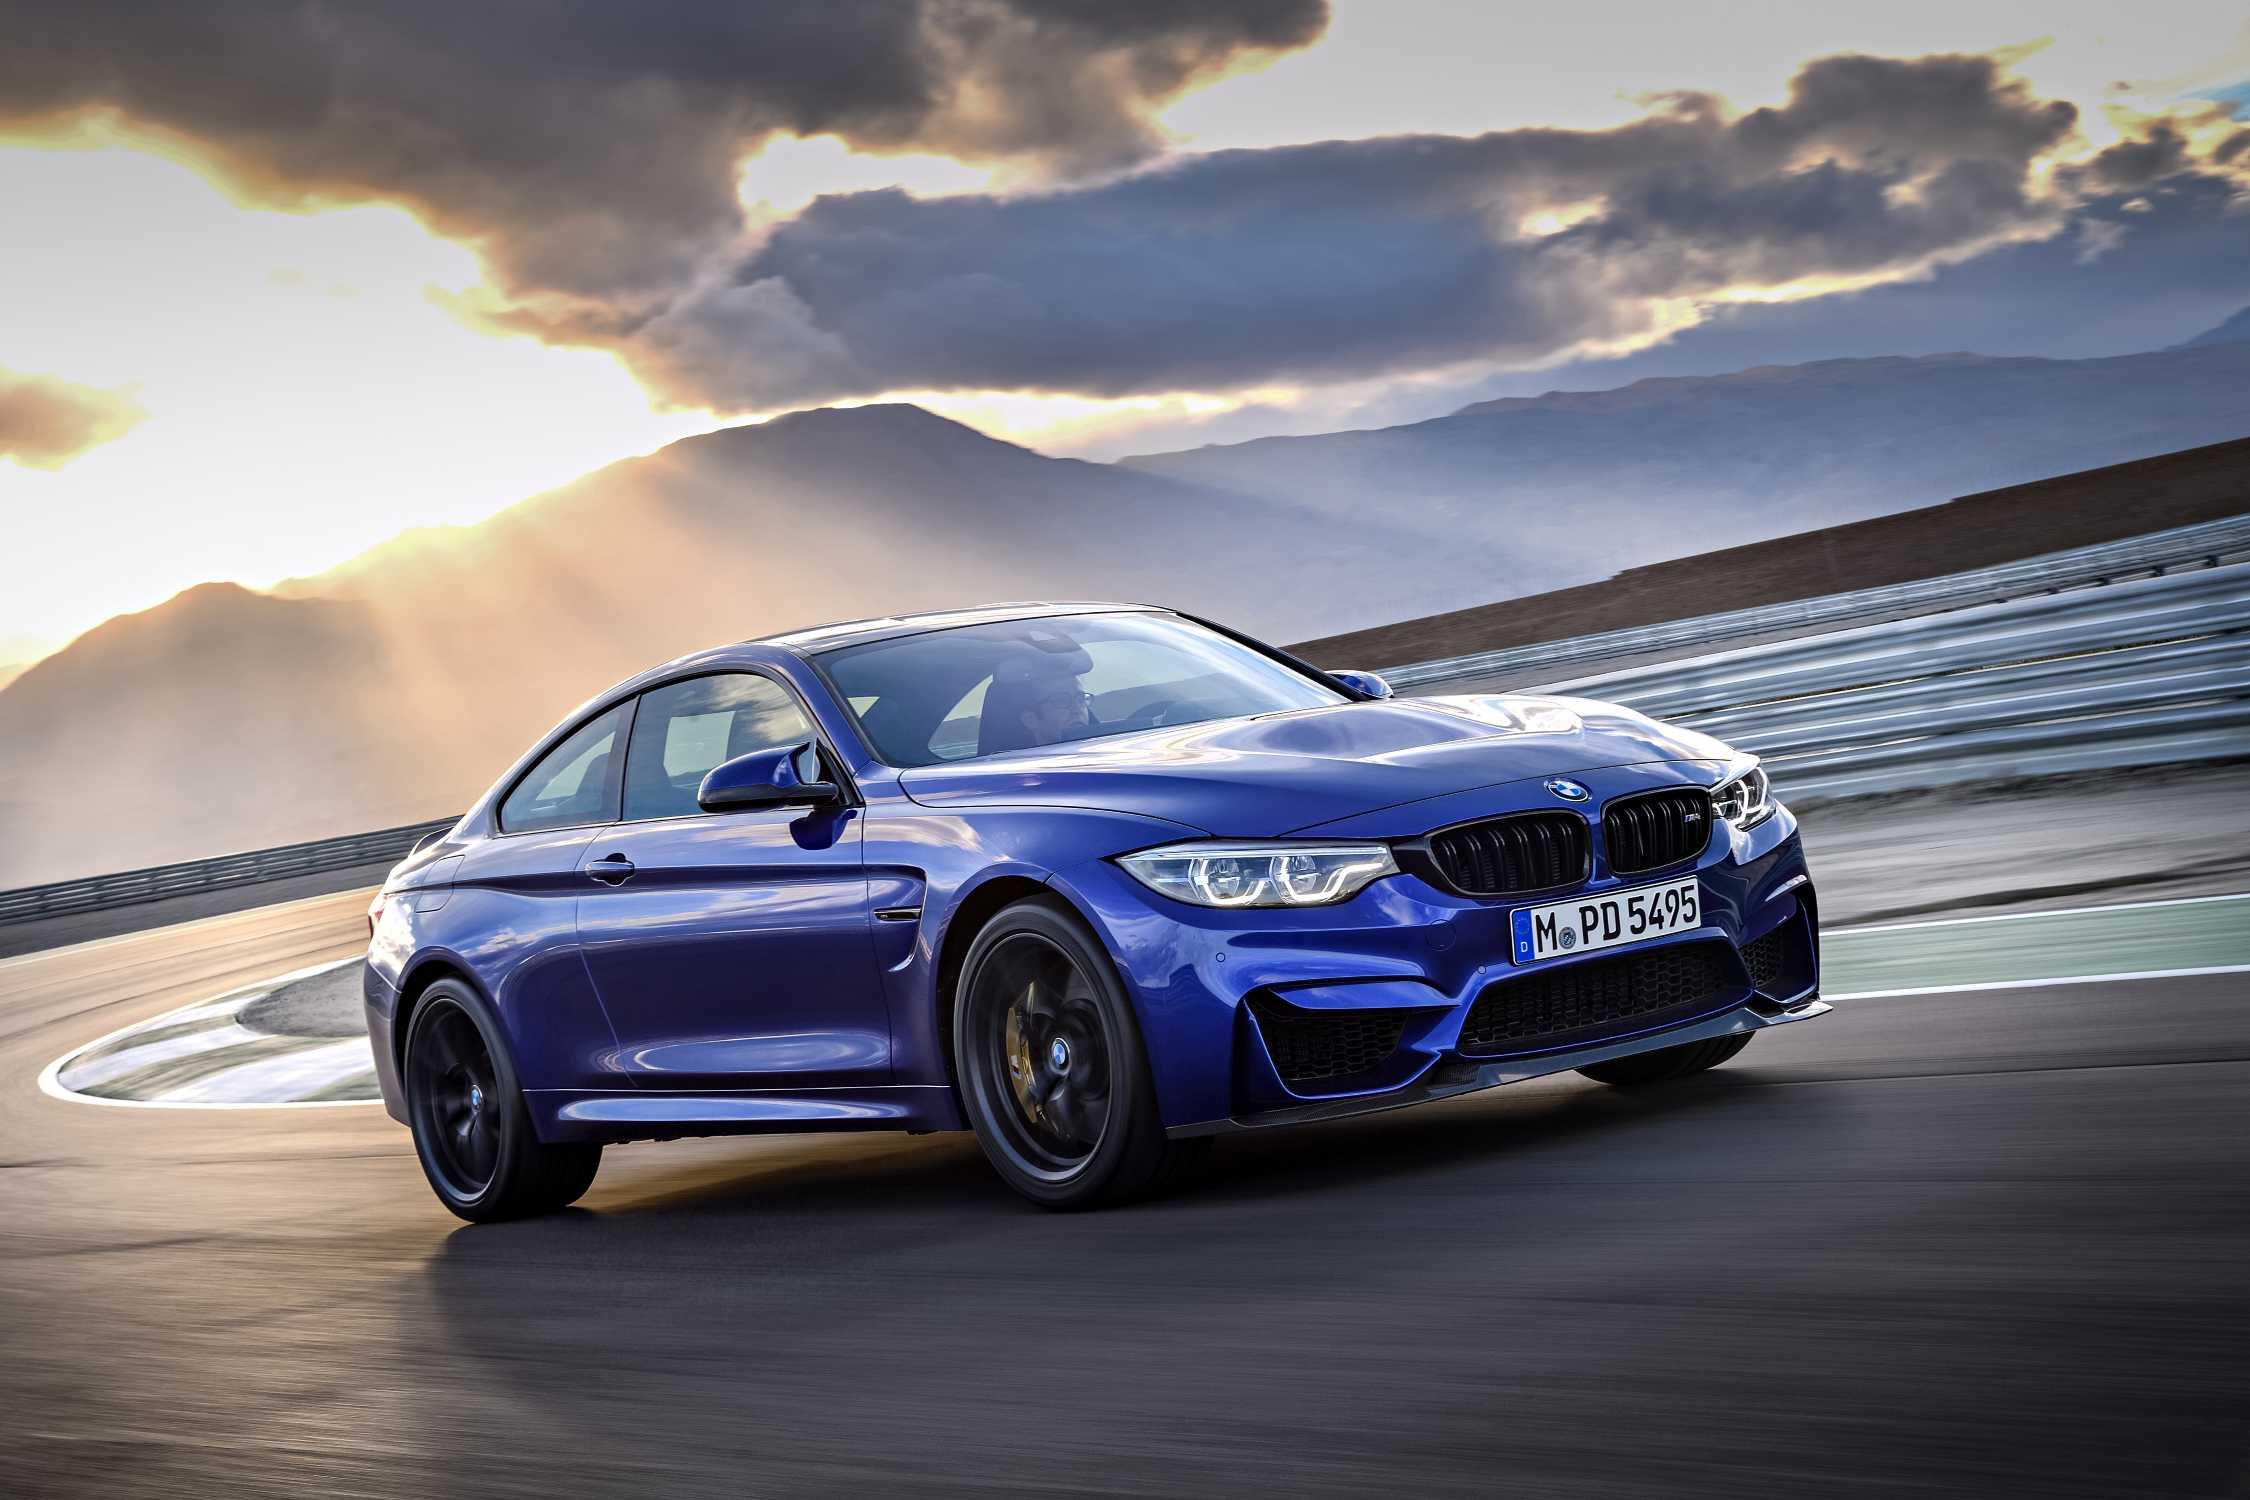 BMW M CS San Marino Blue Metallic - Blue bmw